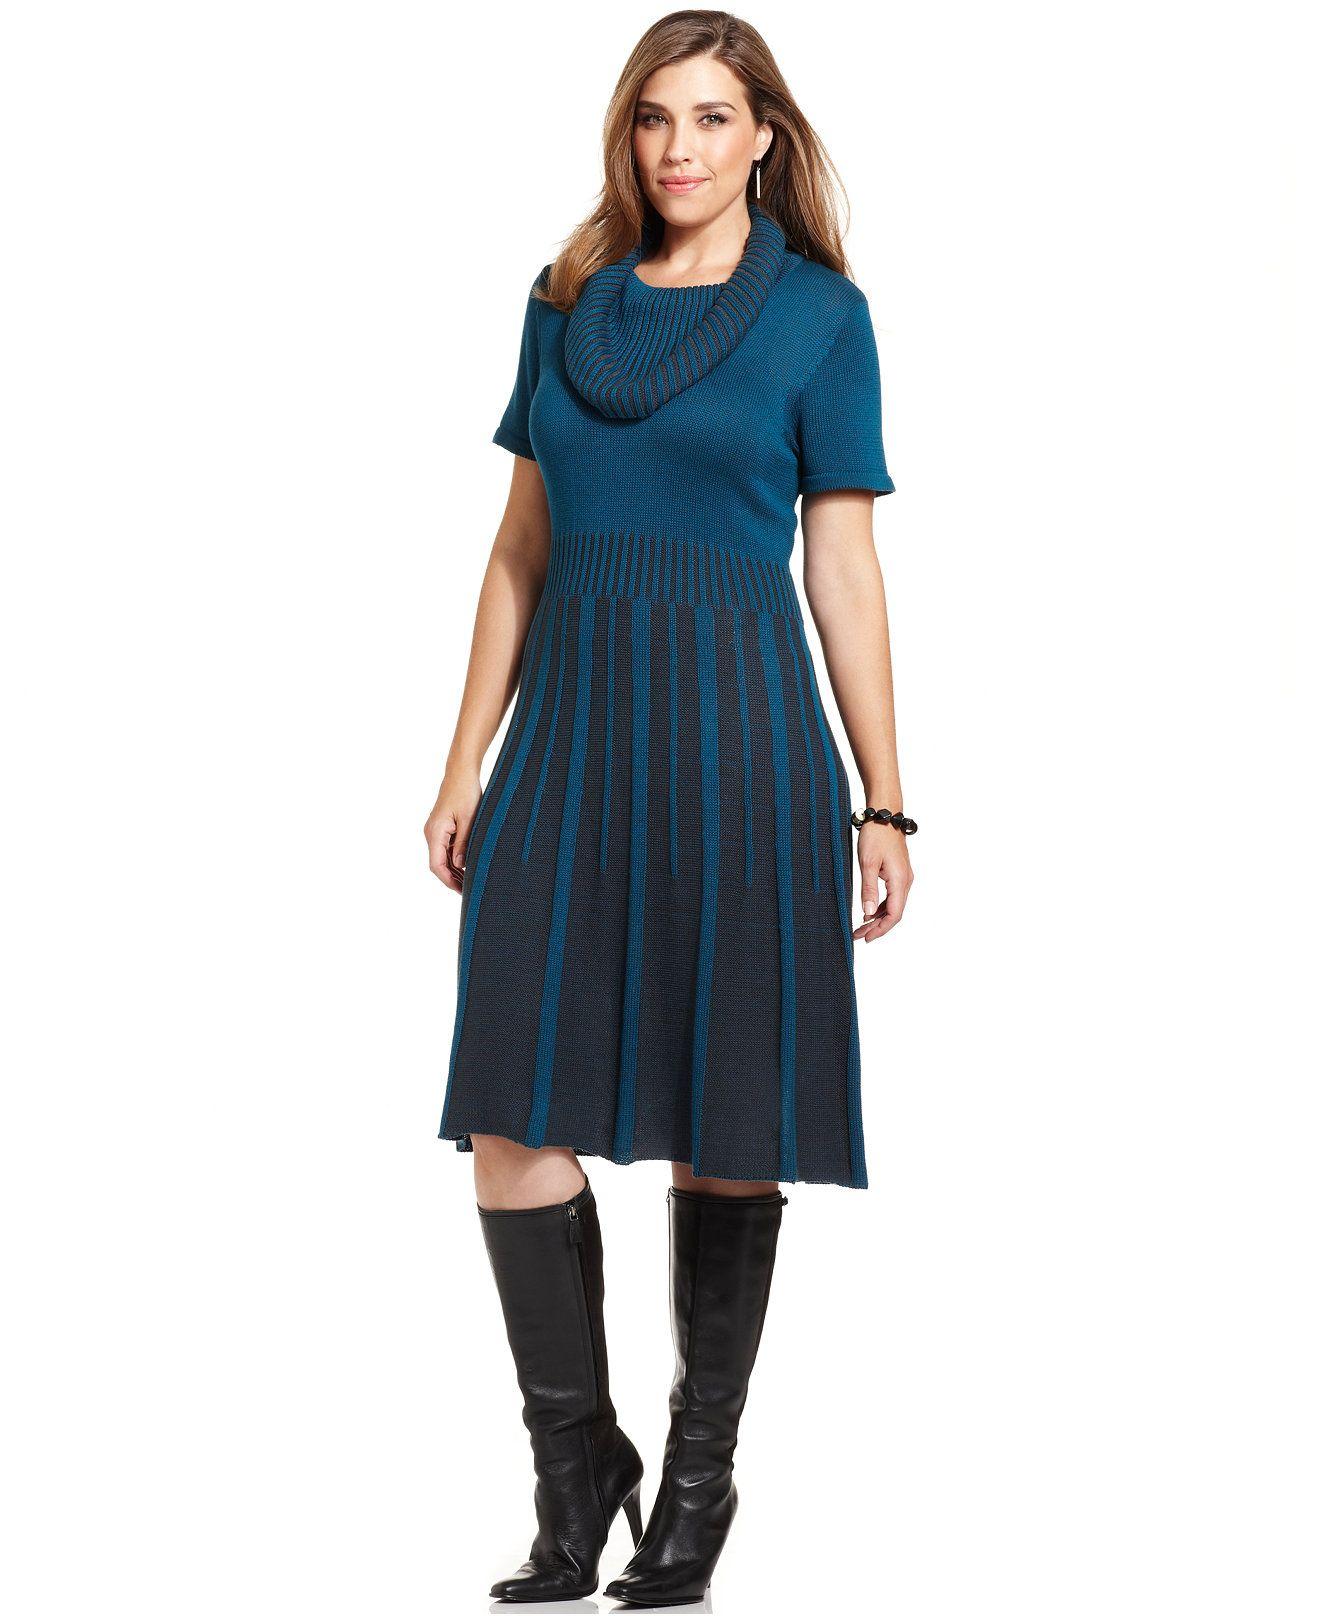 b50b2270bf Alfani Plus Size Striped Cowl-Neck Sweater Dress - Plus Size Sale    Clearance - Plus Sizes - Macy s